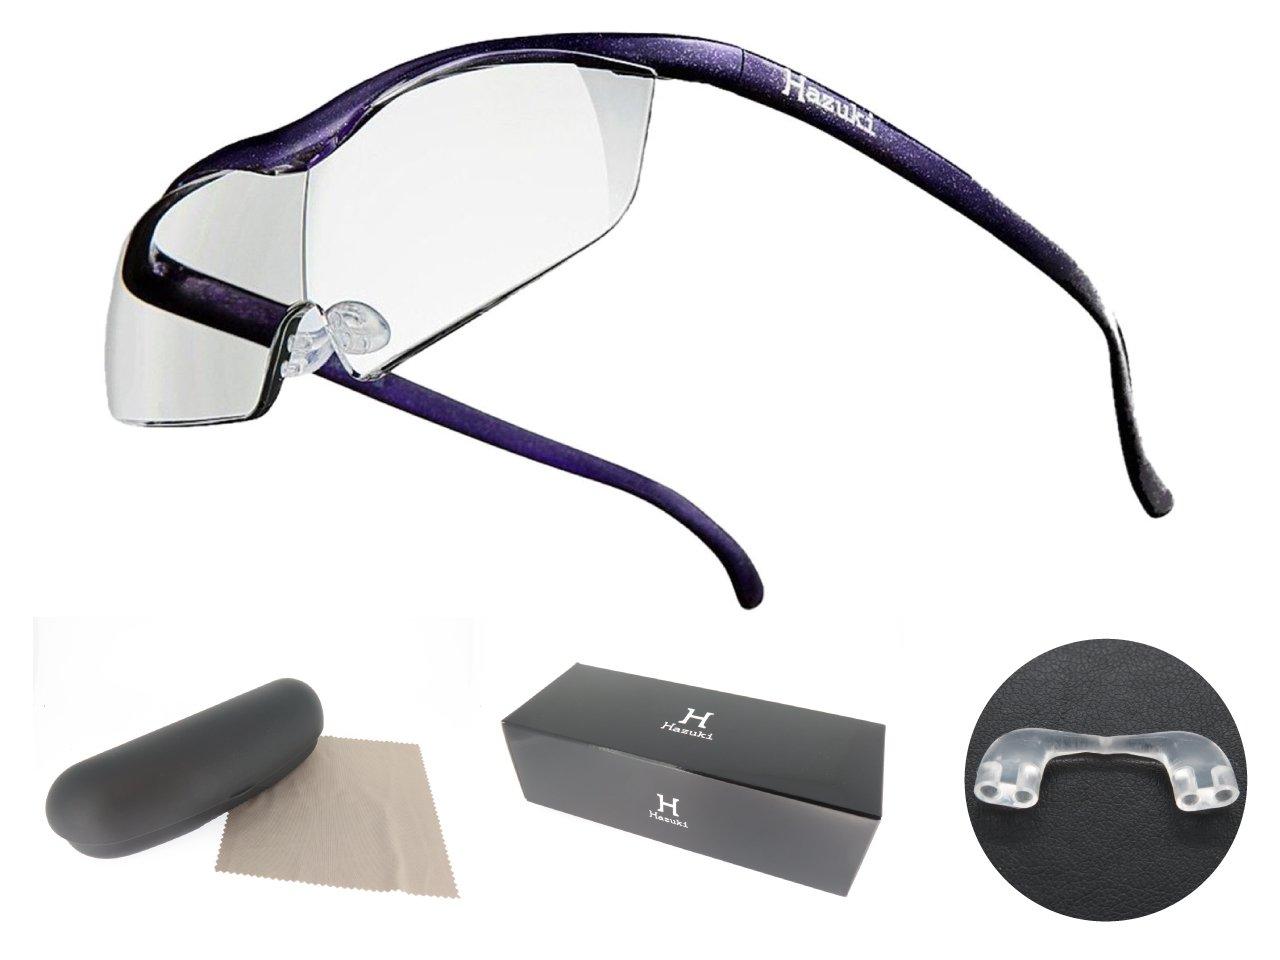 Hazuki ハズキルーペ ラージ 倍率1.6 クリアレンズ 2017年モデル 正規品 スペアパット付 (紫) B0798JPFFV  紫